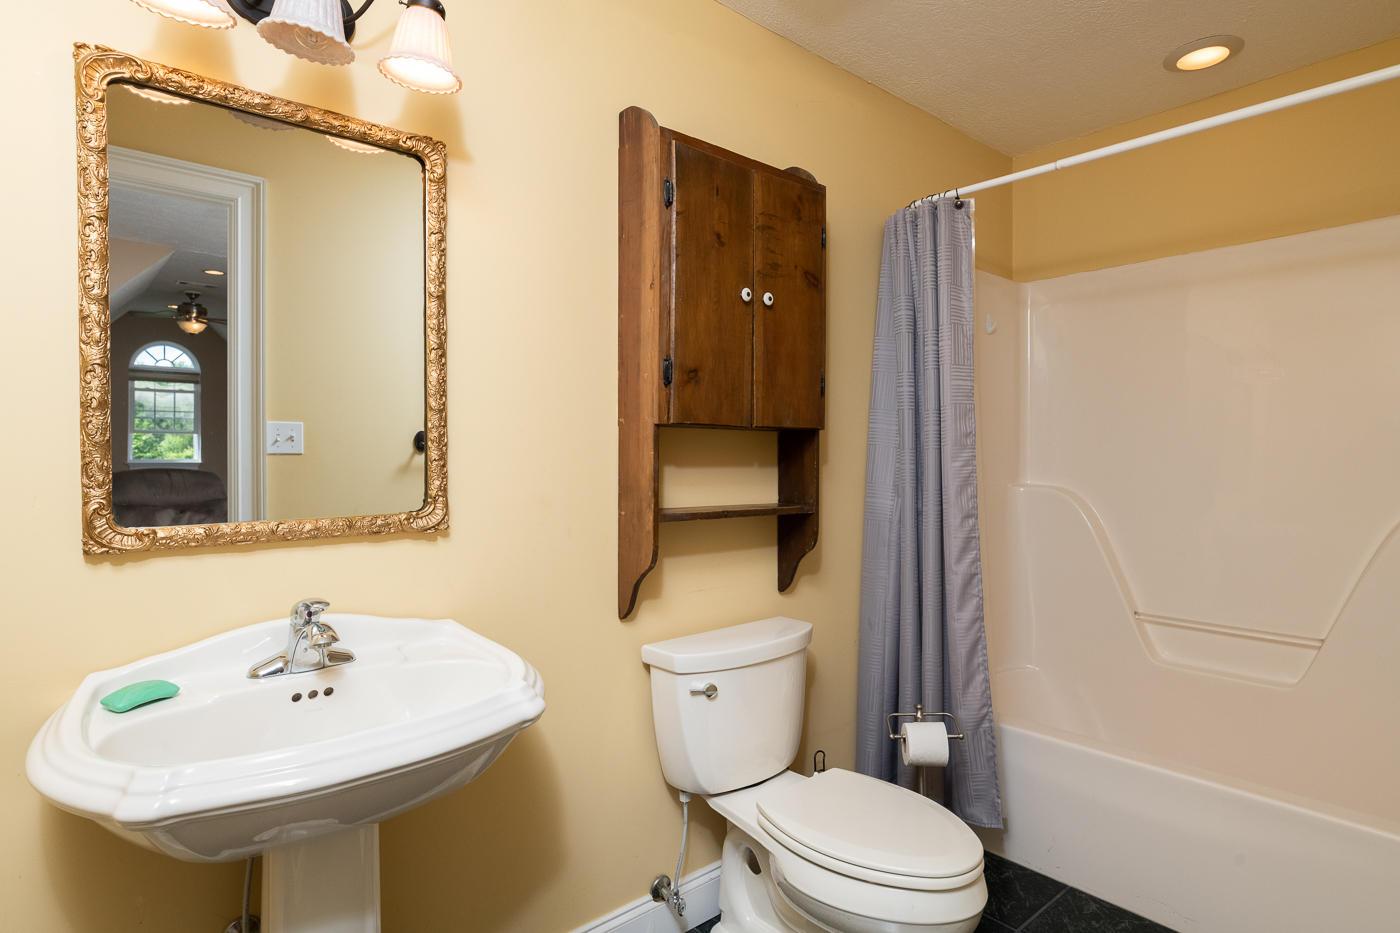 140 Ocoee River Landing, Benton, Tennessee, United States 37307, 3 Bedrooms Bedrooms, ,3 BathroomsBathrooms,Single Family,For Sale,Ocoee River Landing,1098263